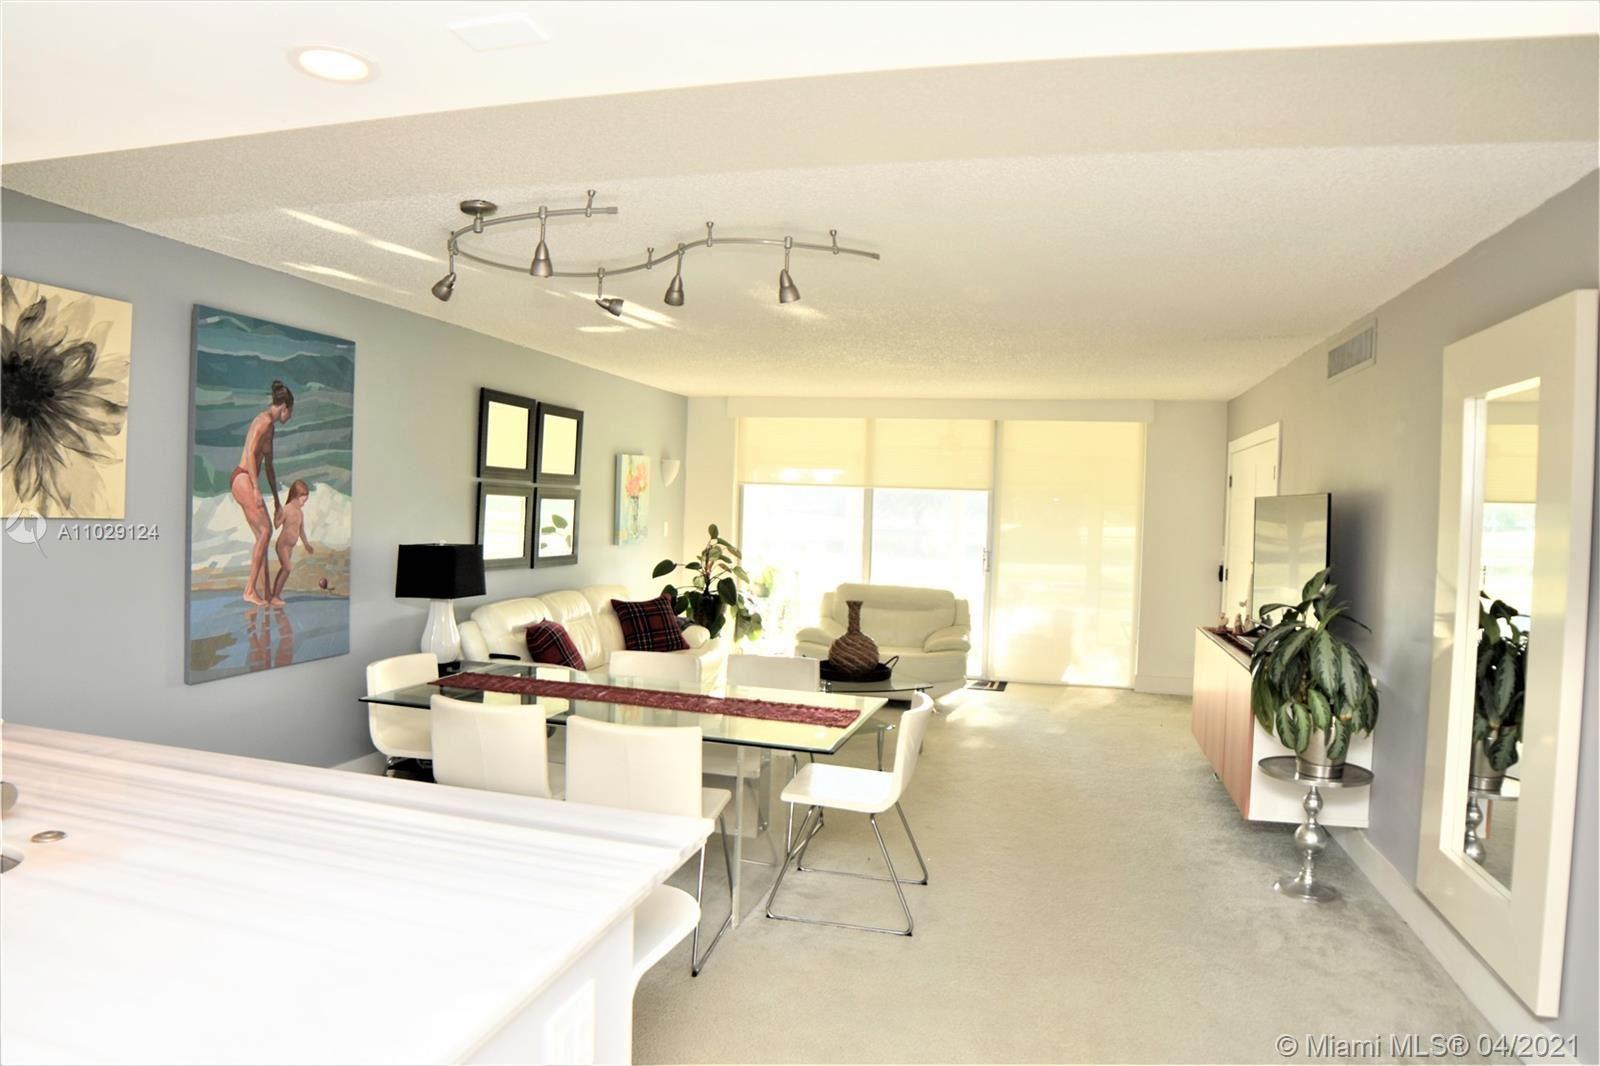 Photo of 802 Cypress Blvd #101B, Pompano Beach, FL 33069 (MLS # A11029124)